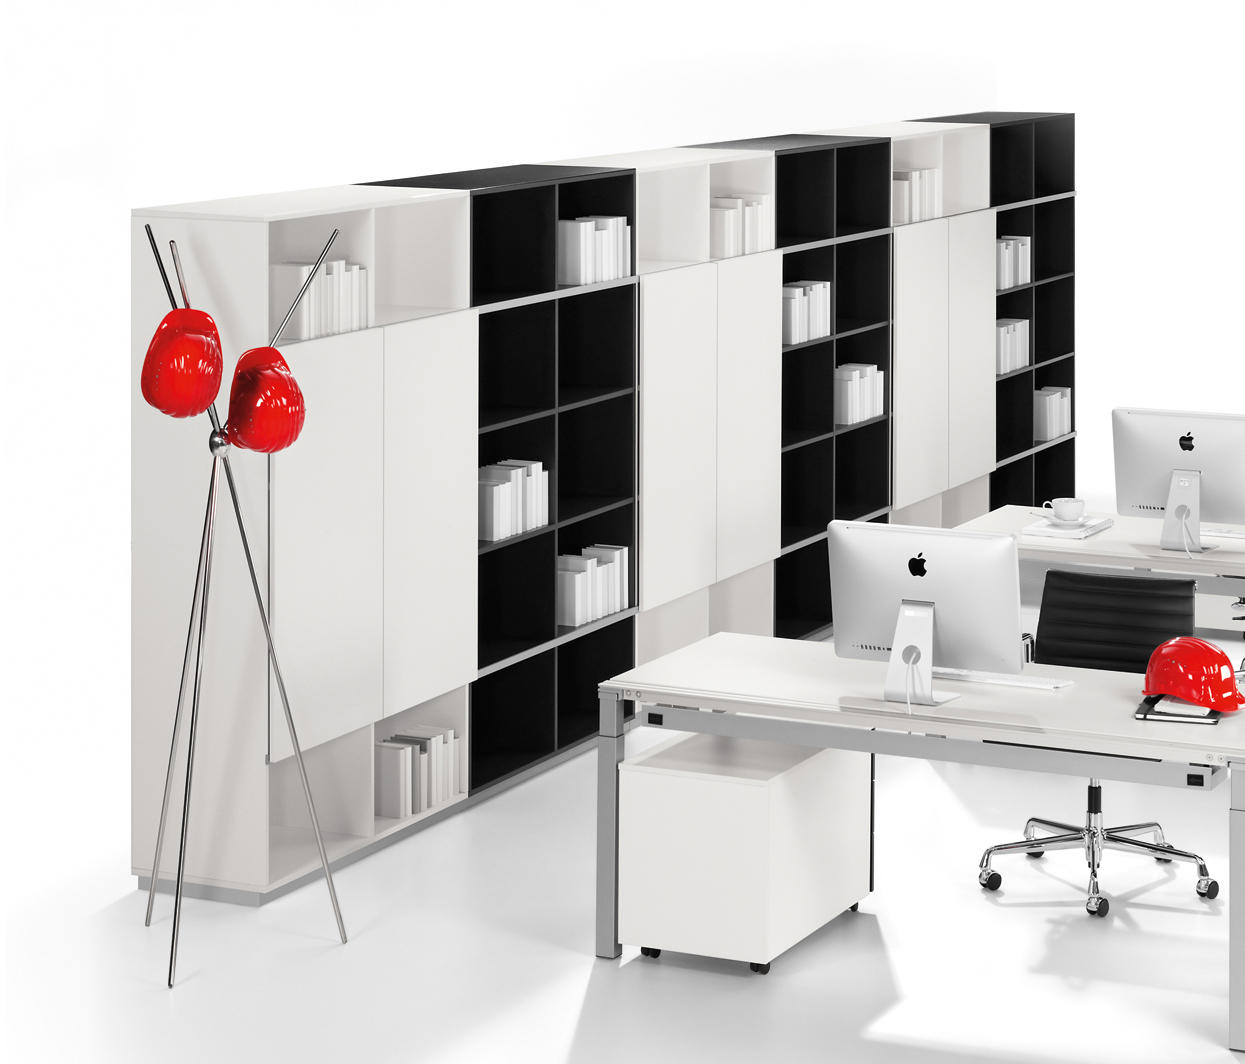 WINEA MAXX - Cabinets from WINI Büromöbel | Architonic